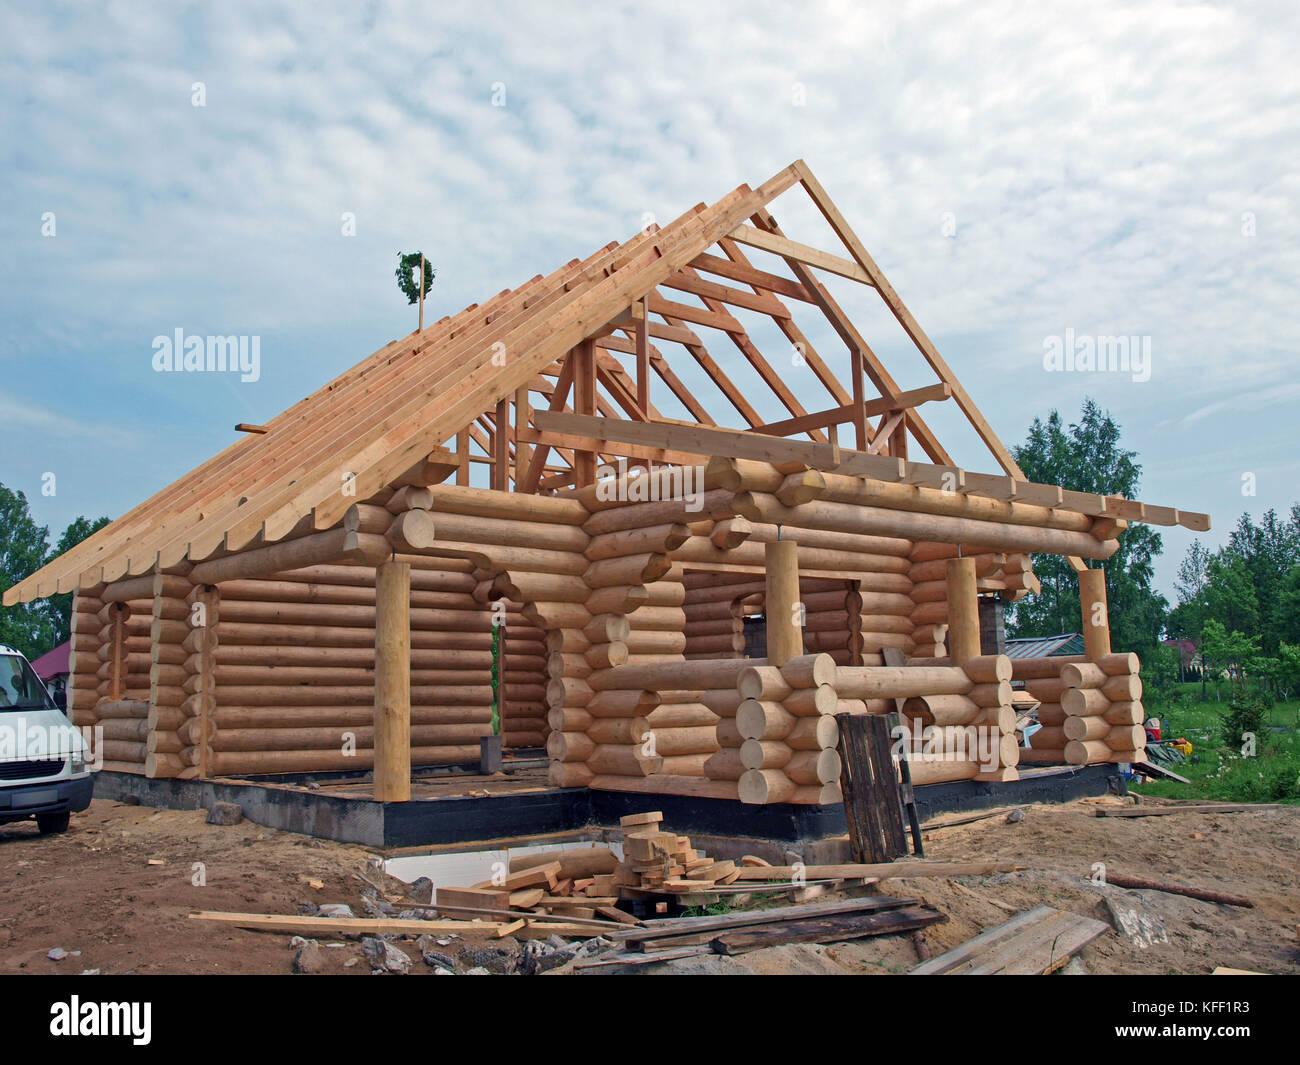 Holzhaus Aus Rundholz, Im Bau Stockbild